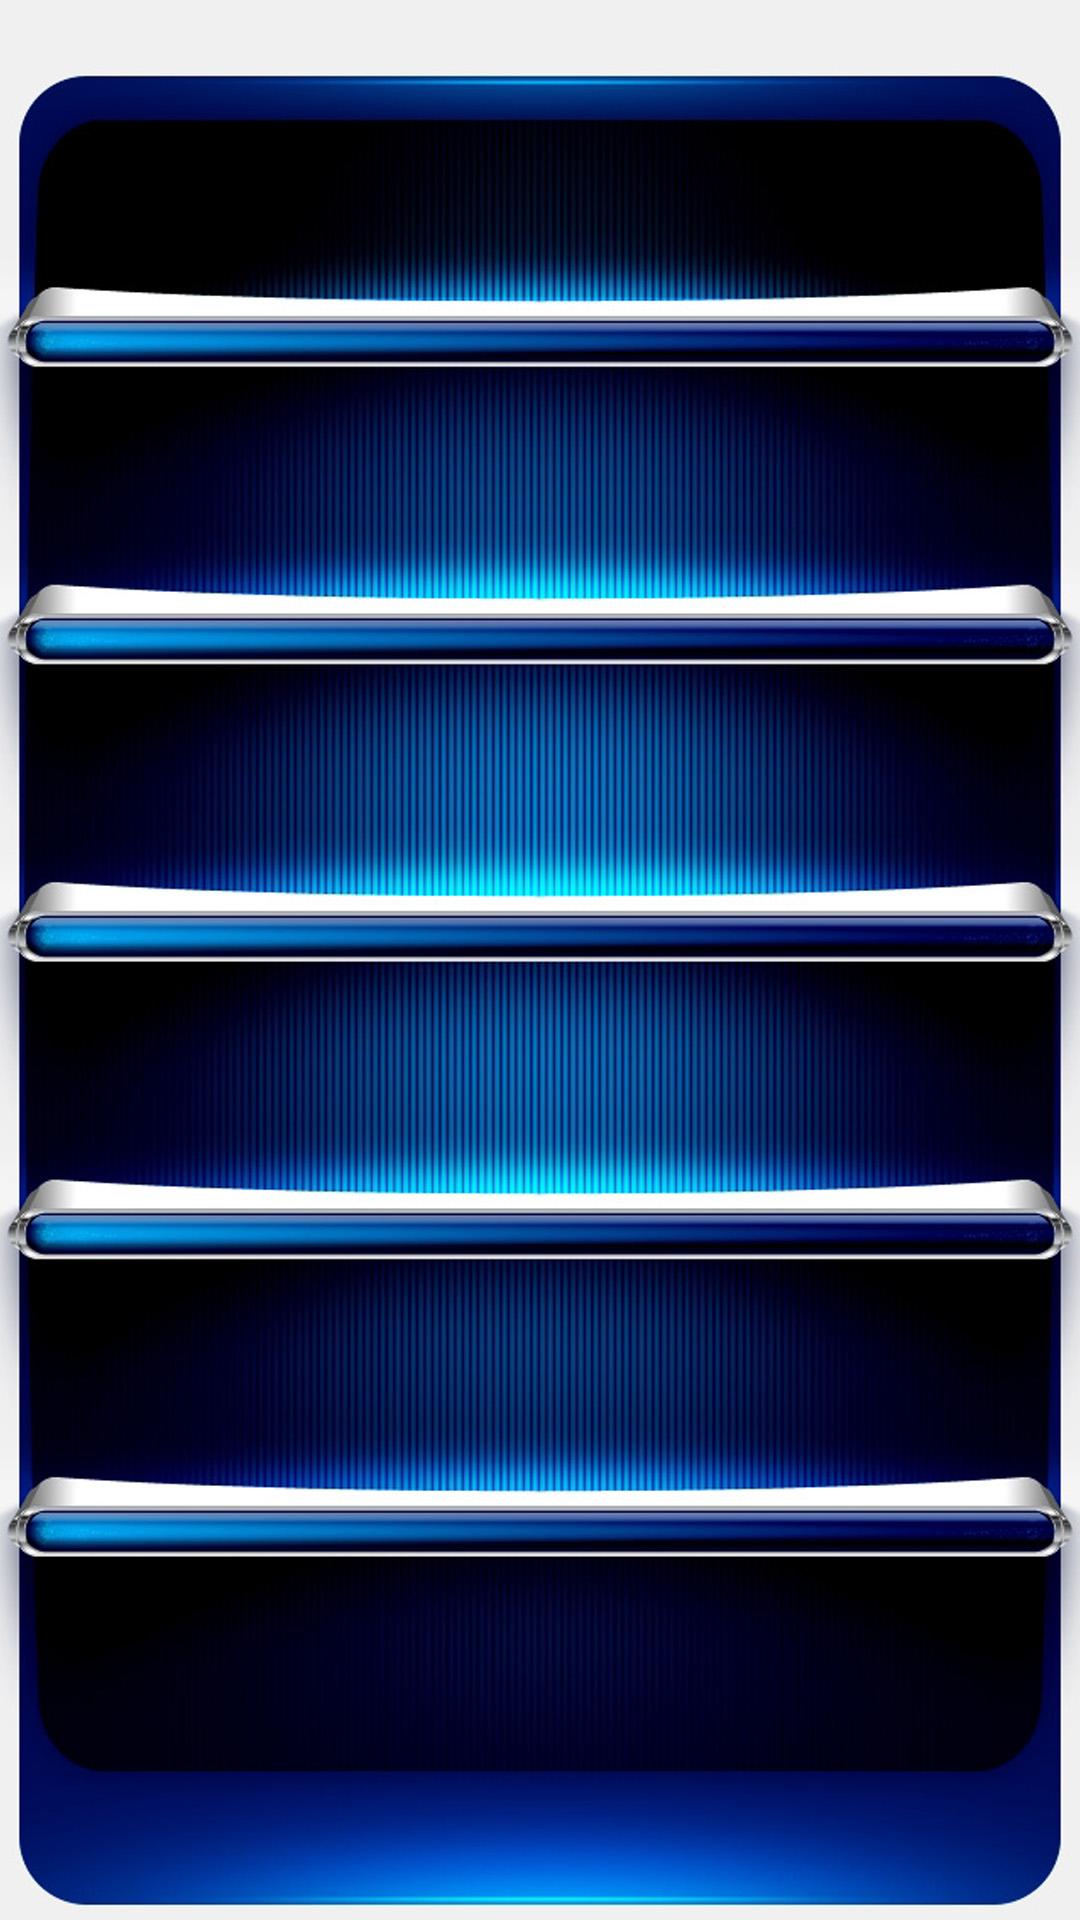 Download Sfondo Mensole Iphone 6 Plus 12 Sfondi Iphone 1080x1920